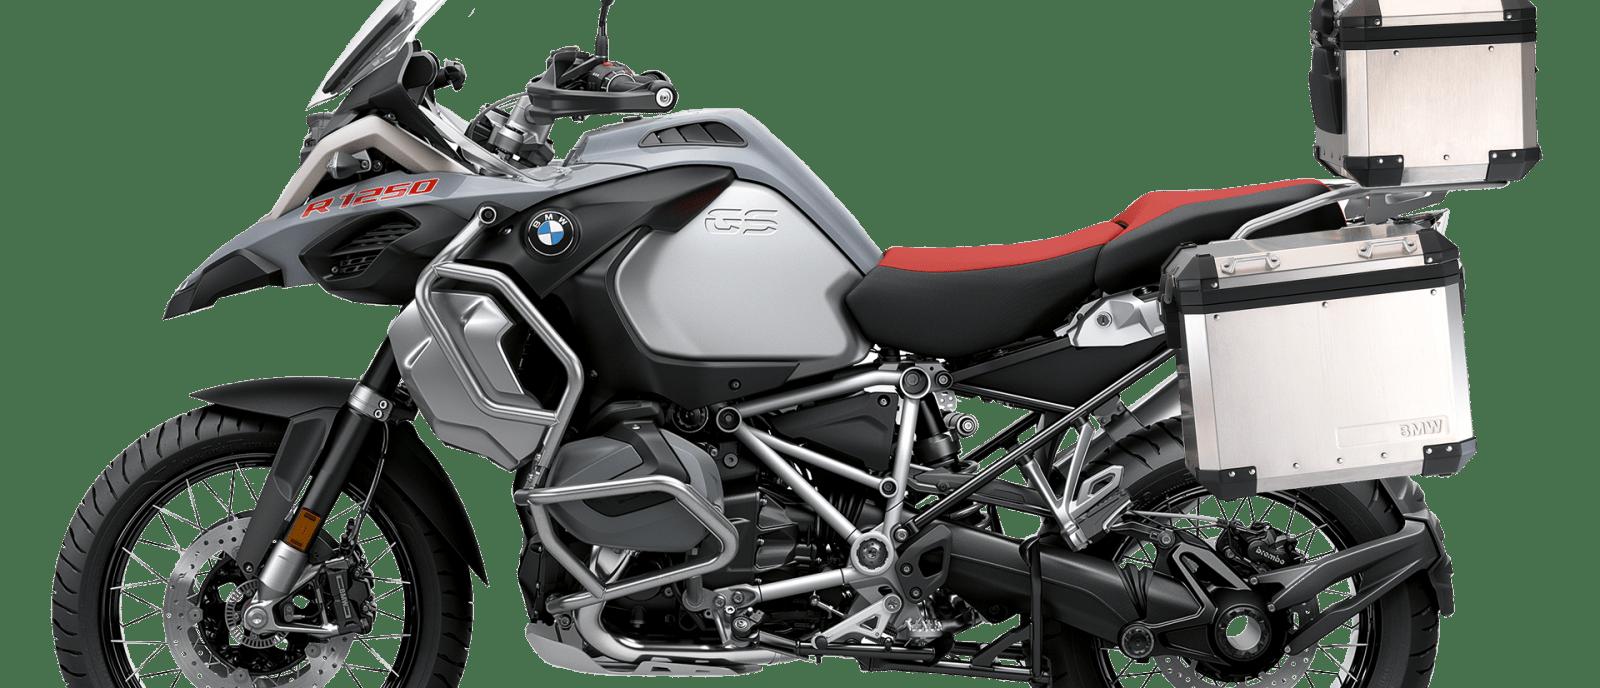 r1250gs-adv-large